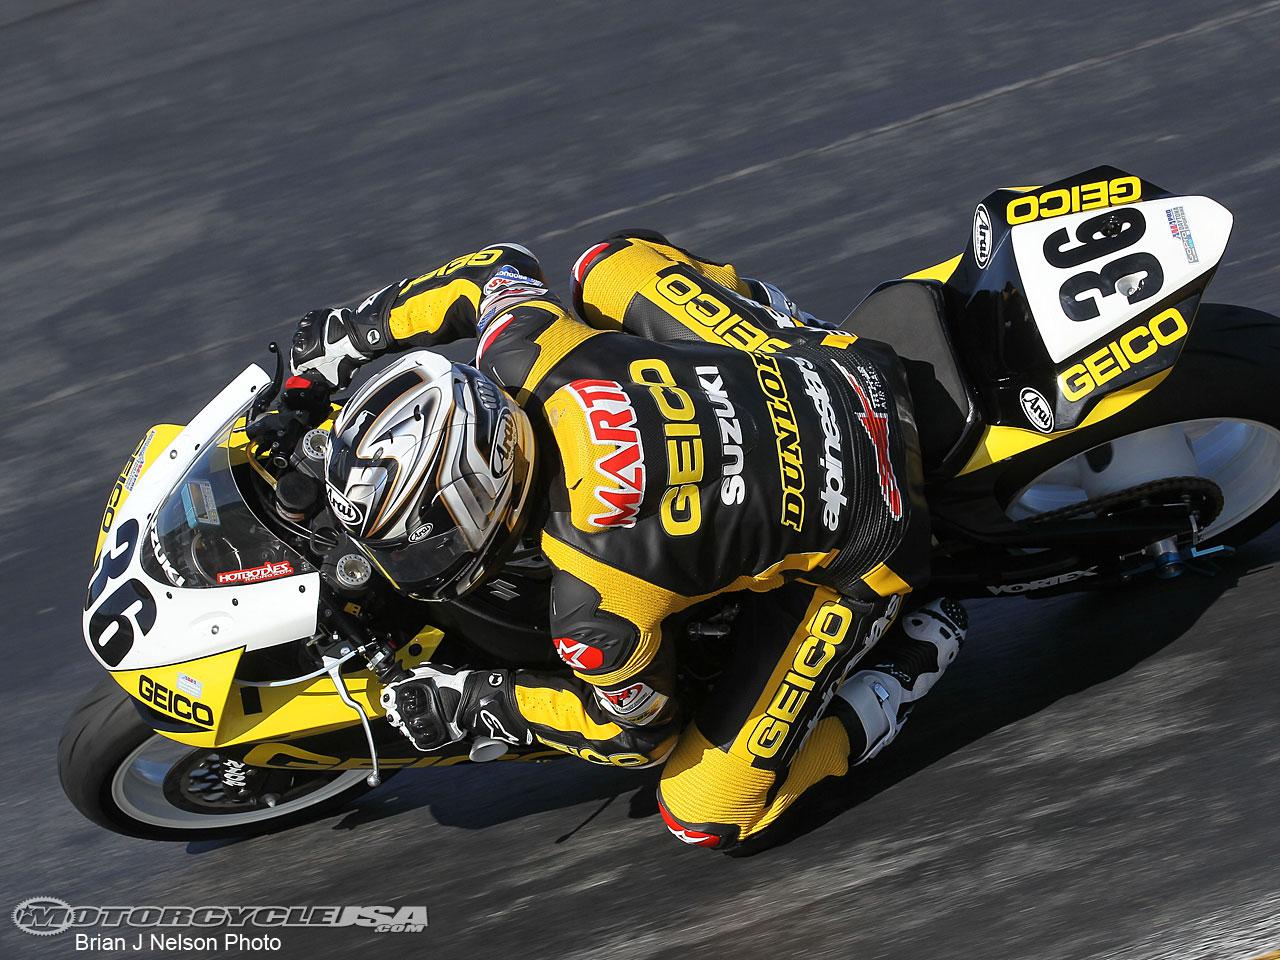 Daytona 200 2012 - Page 2 Cardenas-Daytona-1